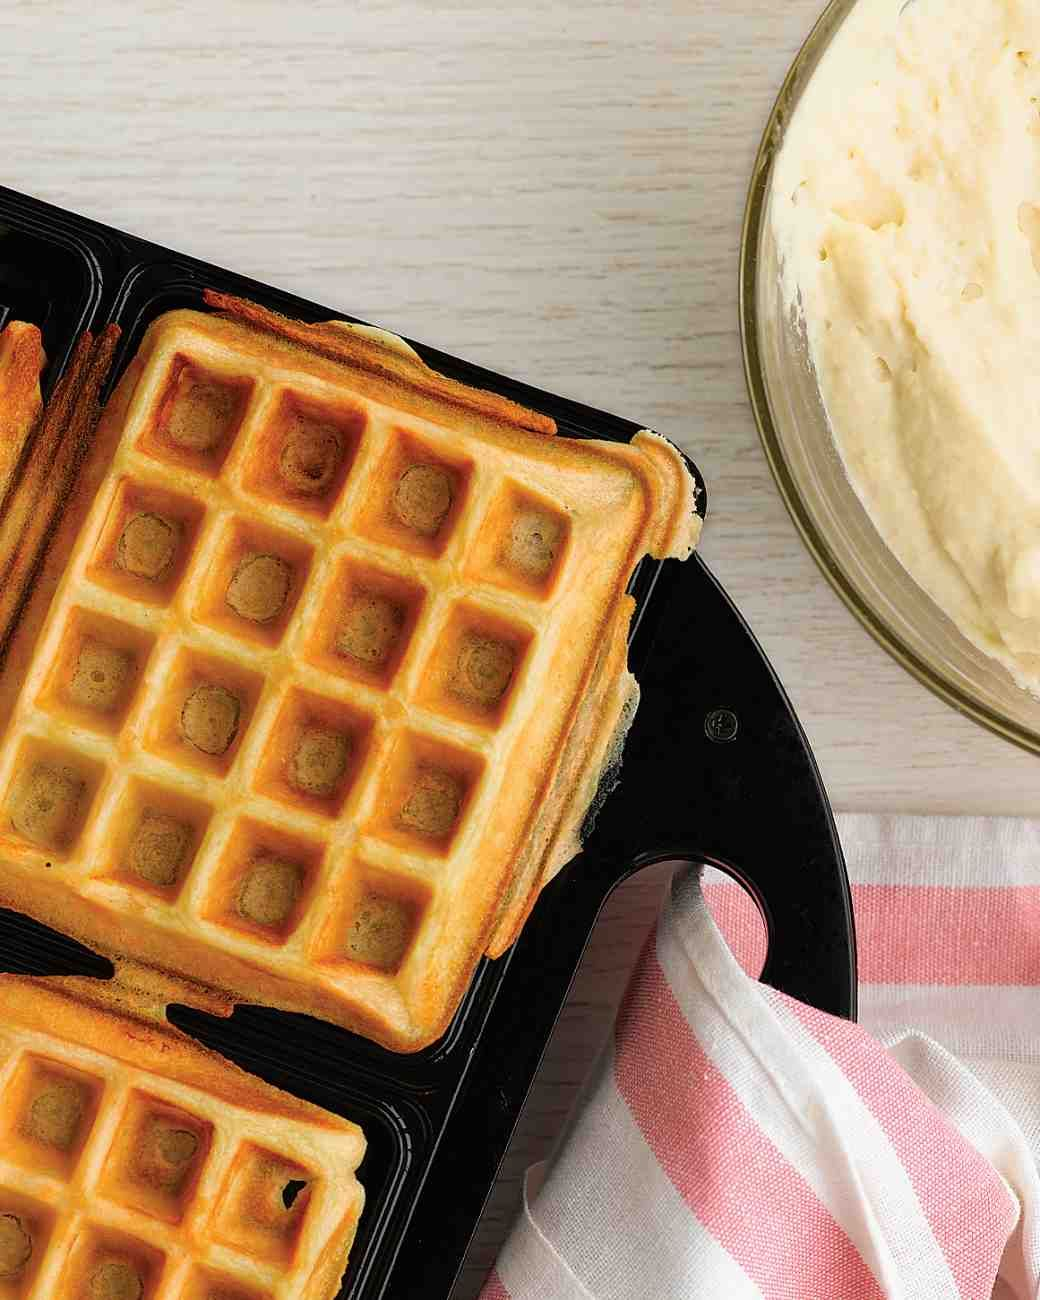 Buttermilk Waffles Recipe Buttermilk Waffles Buttermilk Waffle Recipe Martha Stewart Waffle Recipes